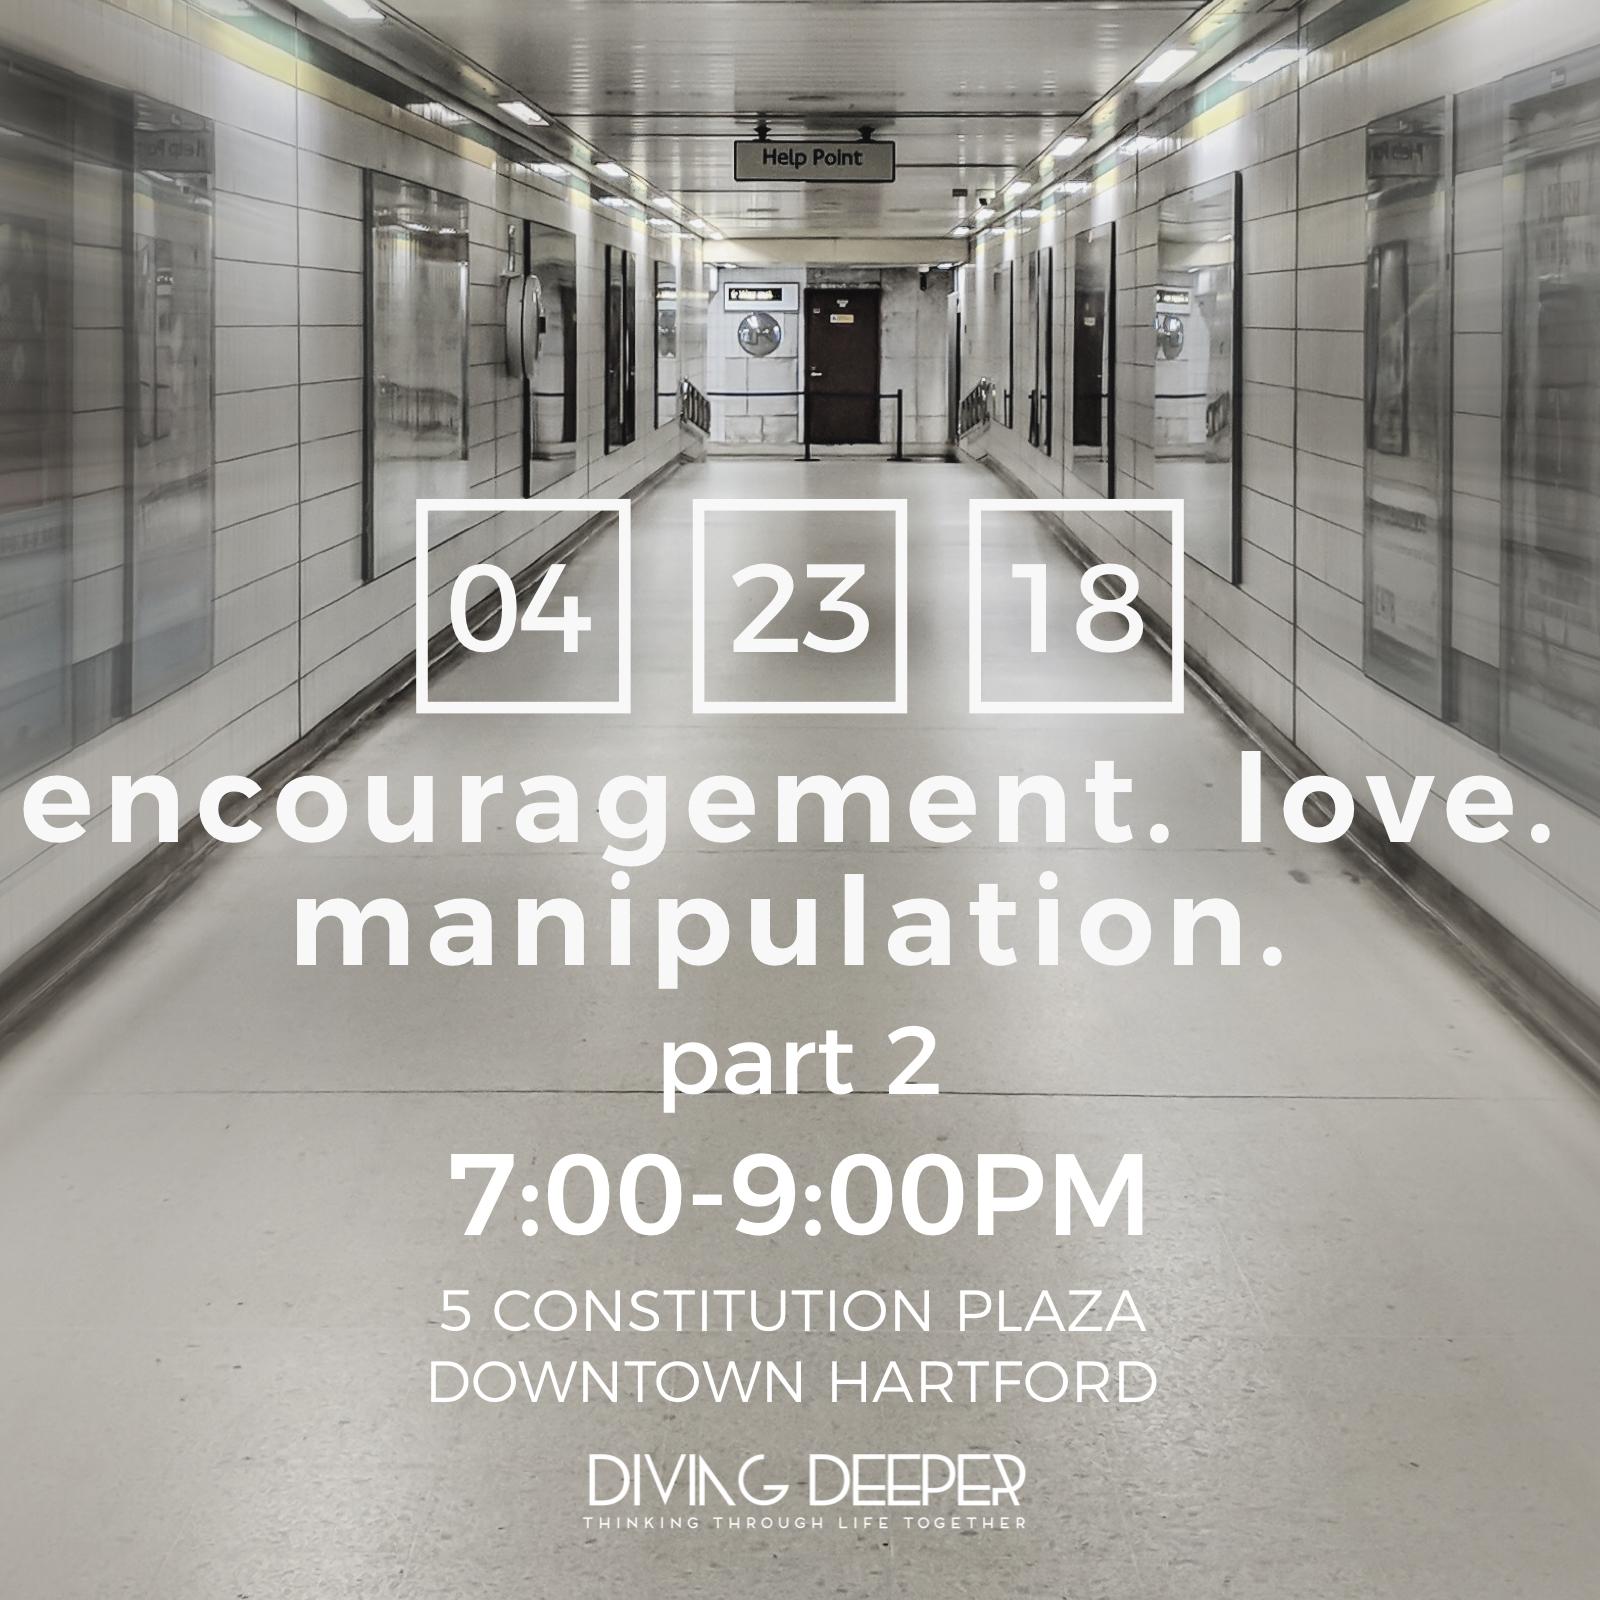 Diving Deeper encouragement love manipulation 2018.JPG